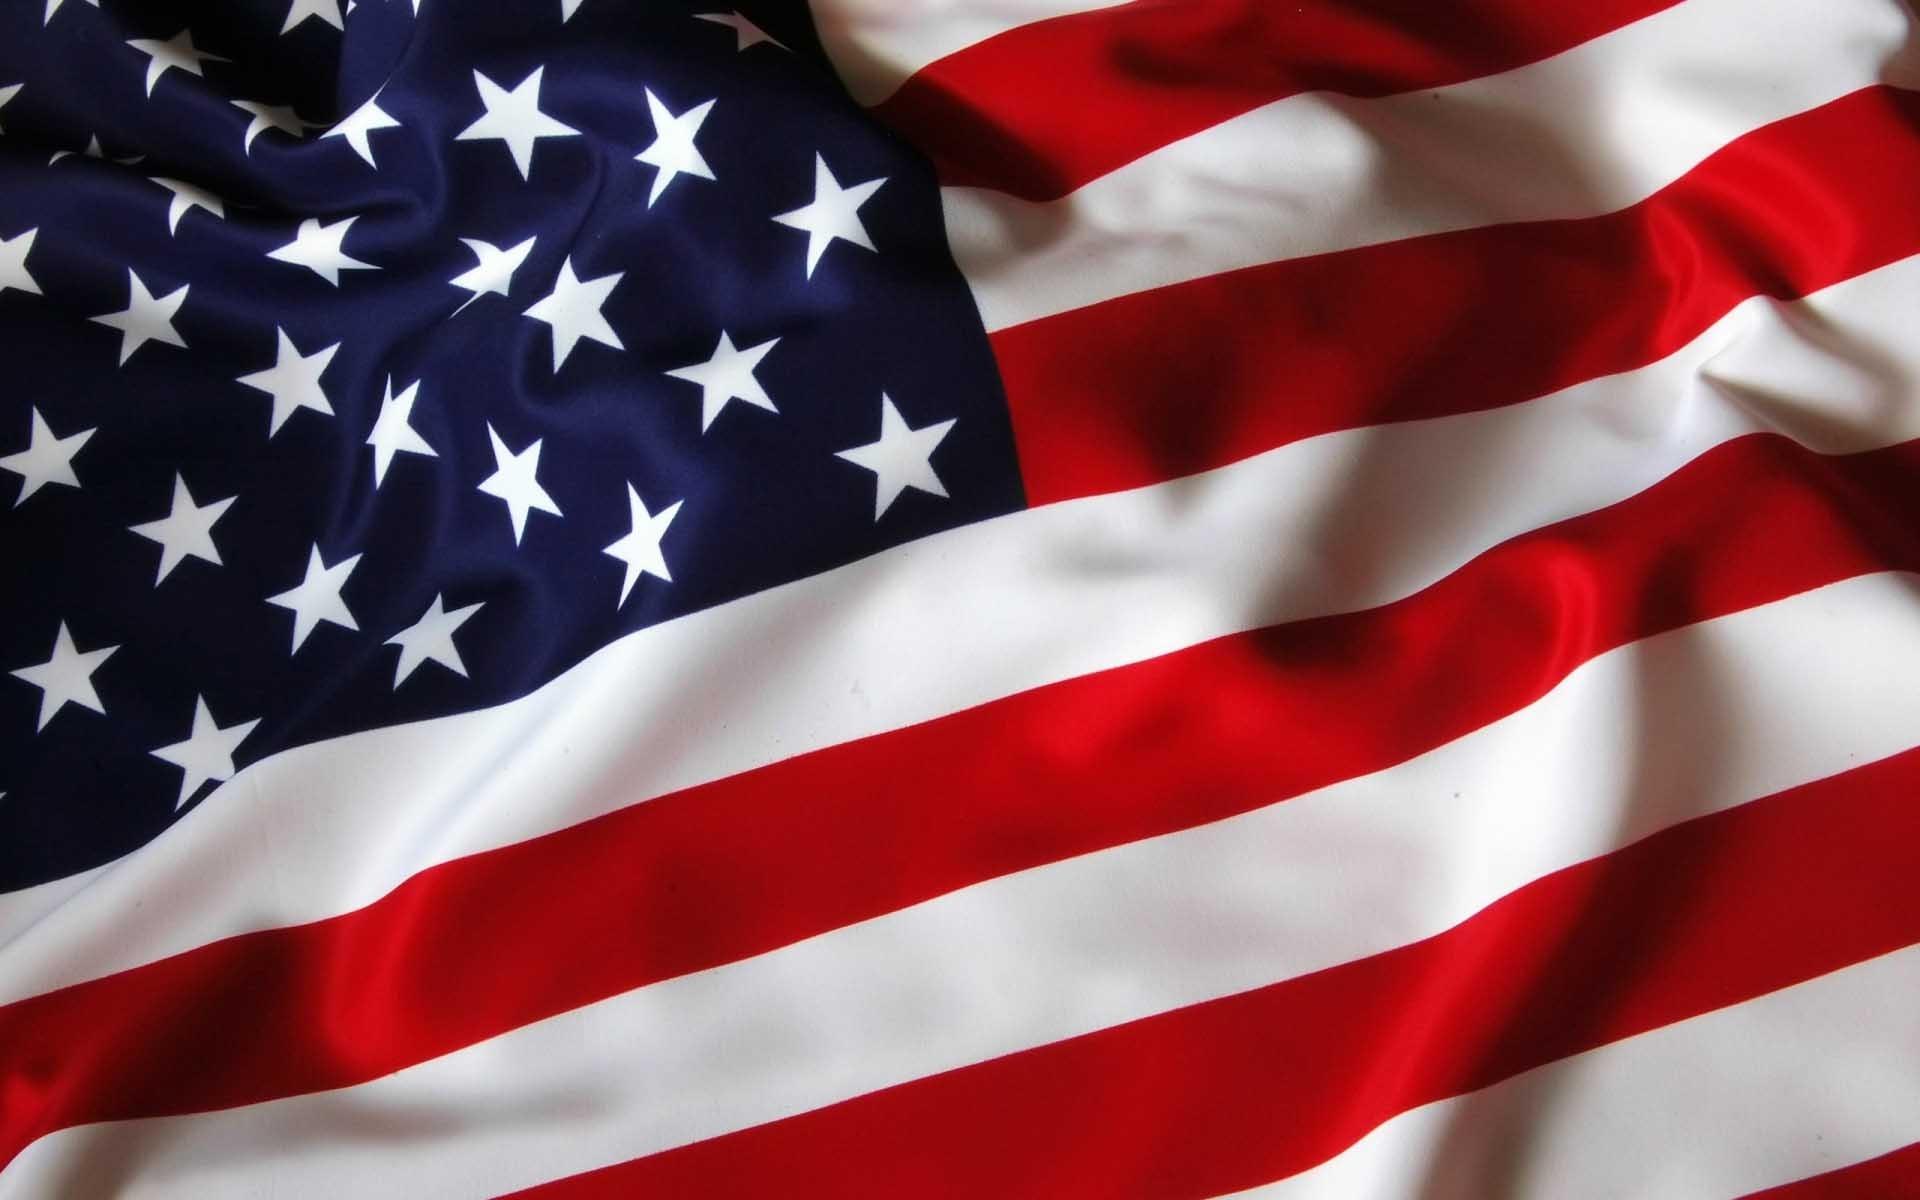 american flag wallpaper 39684 1920x1200 px ~ hdwallsource